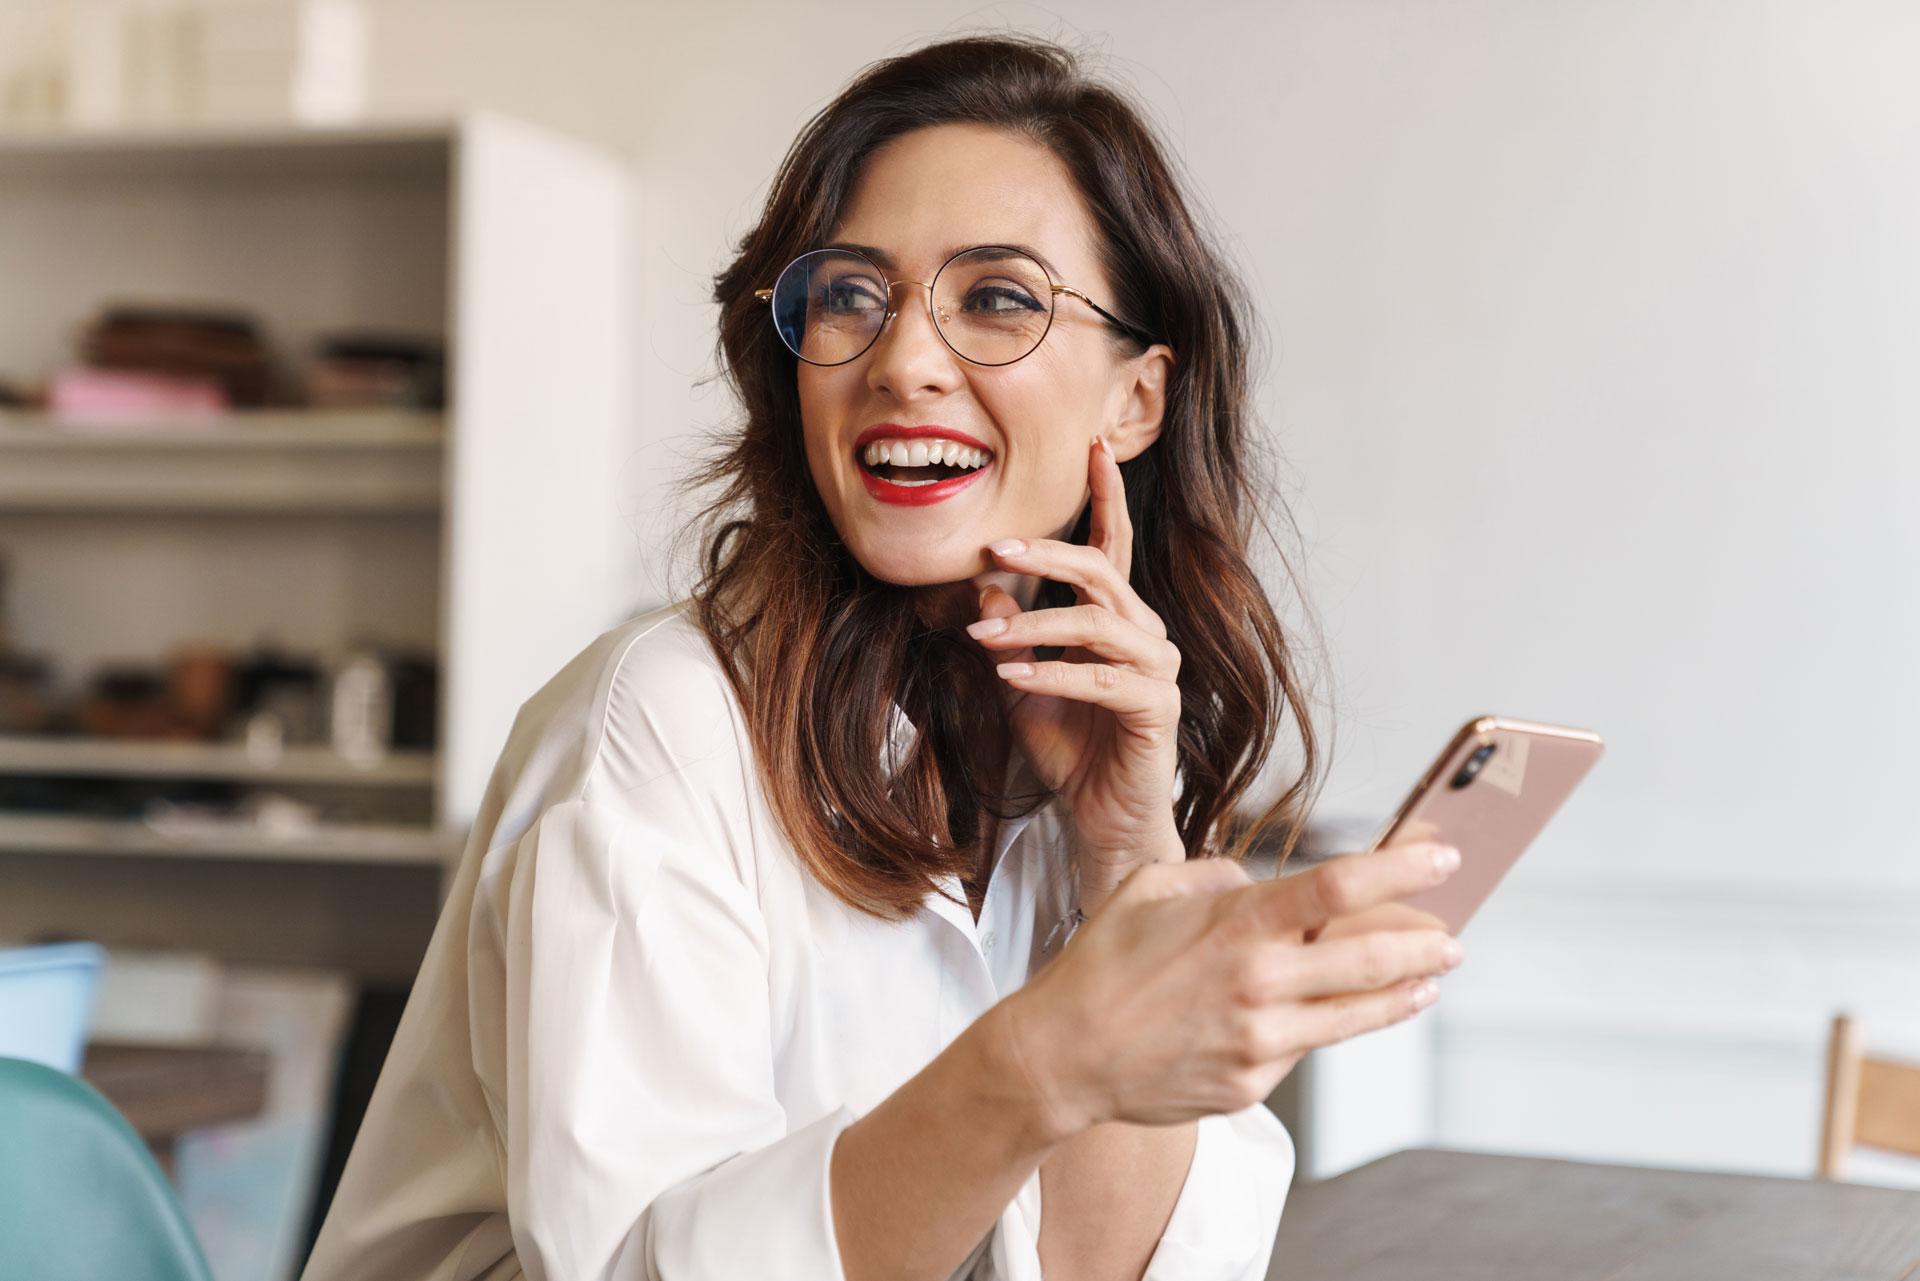 smiling-young-beautiful-woman-using-mobile-phone-XB8WMJW.jpg